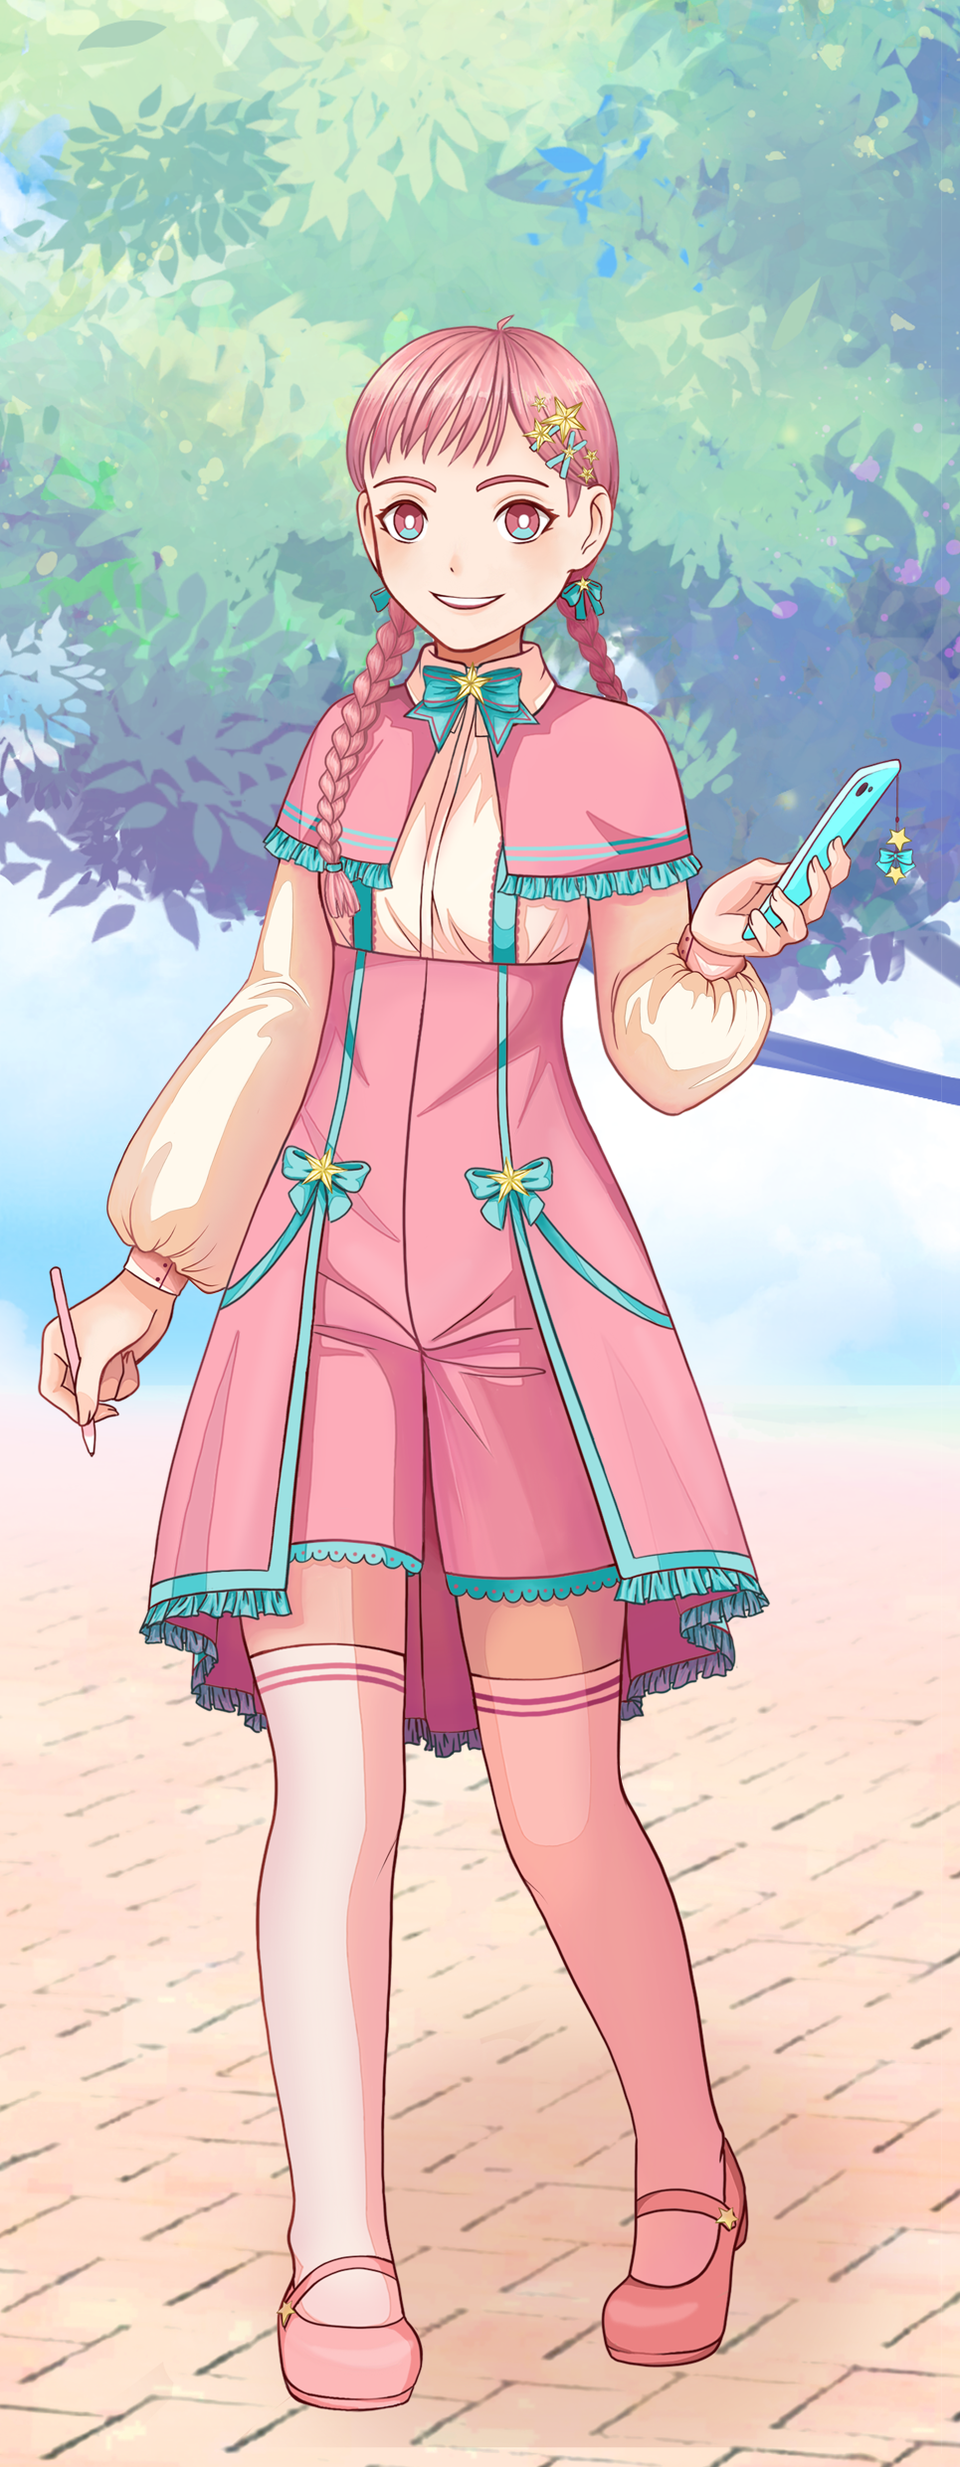 Pastel Sketch Pink Girl Illust of Shurmmi & Izni PASTEL_SKETCH2020 pastel girl